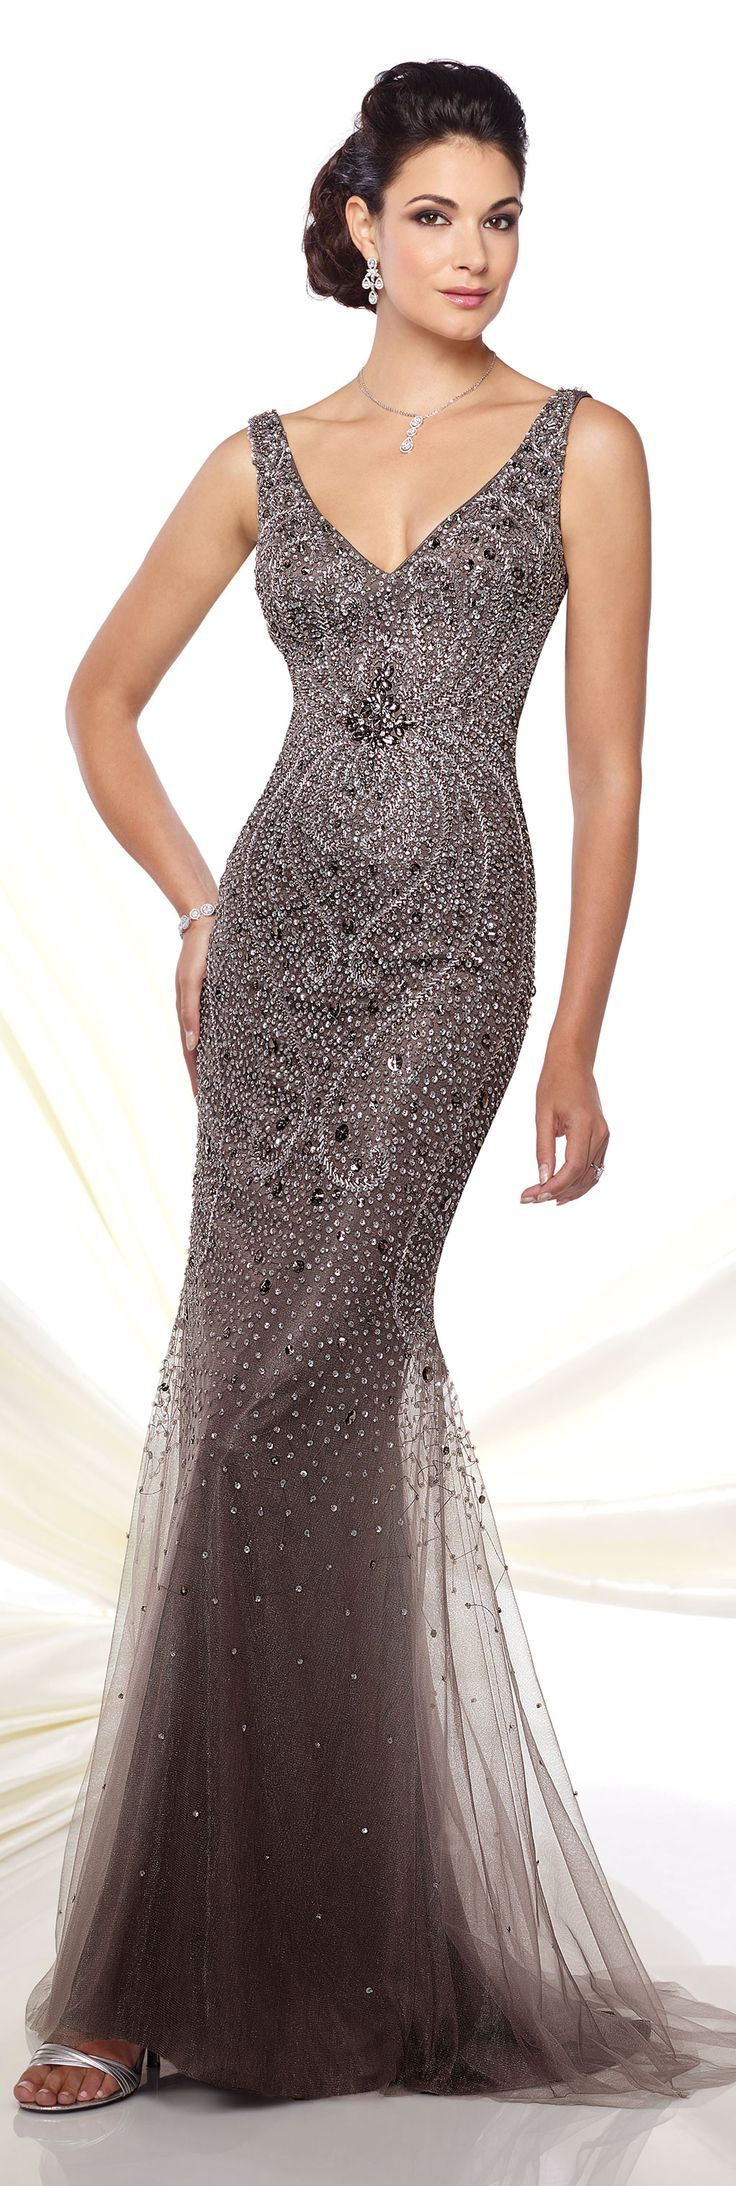 Best 25+ Evening dresses uk ideas on Pinterest | Dresses ...